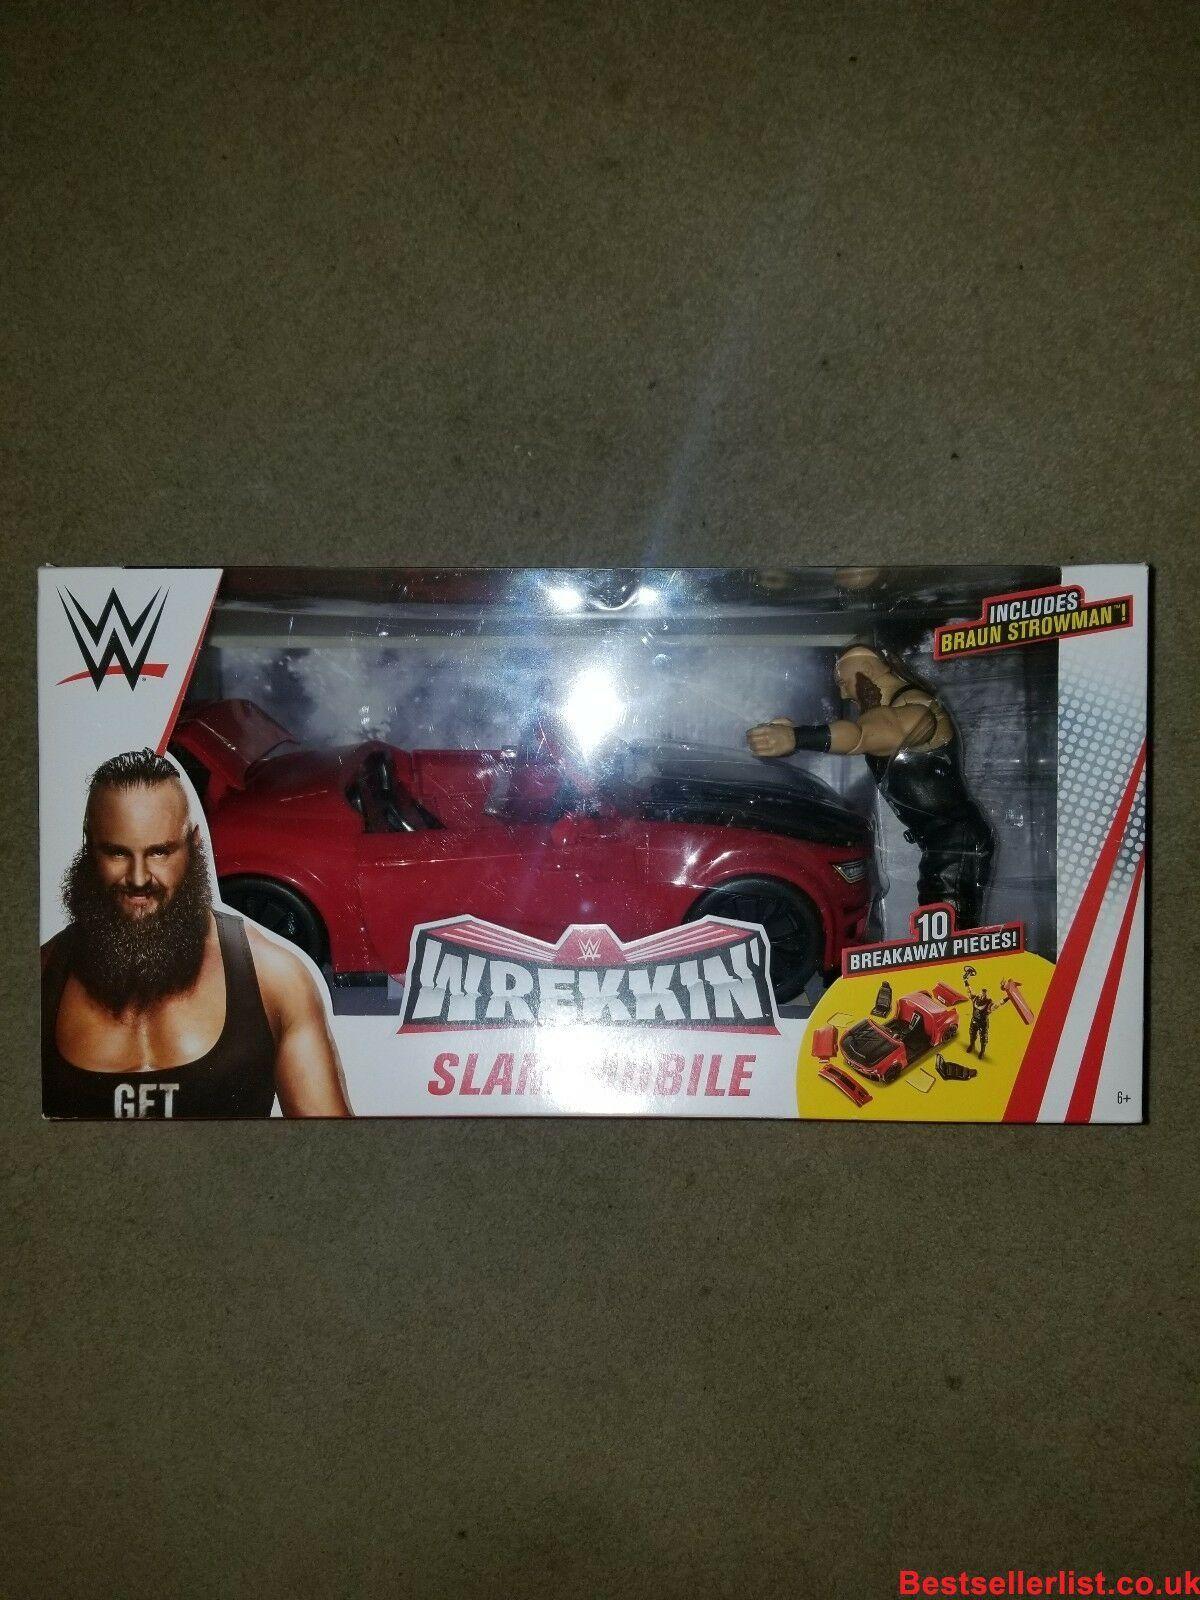 WWE Mattel Braun Strowman Wrekkin Slam Mobile Playset Car Toy Figure Wrestling!!